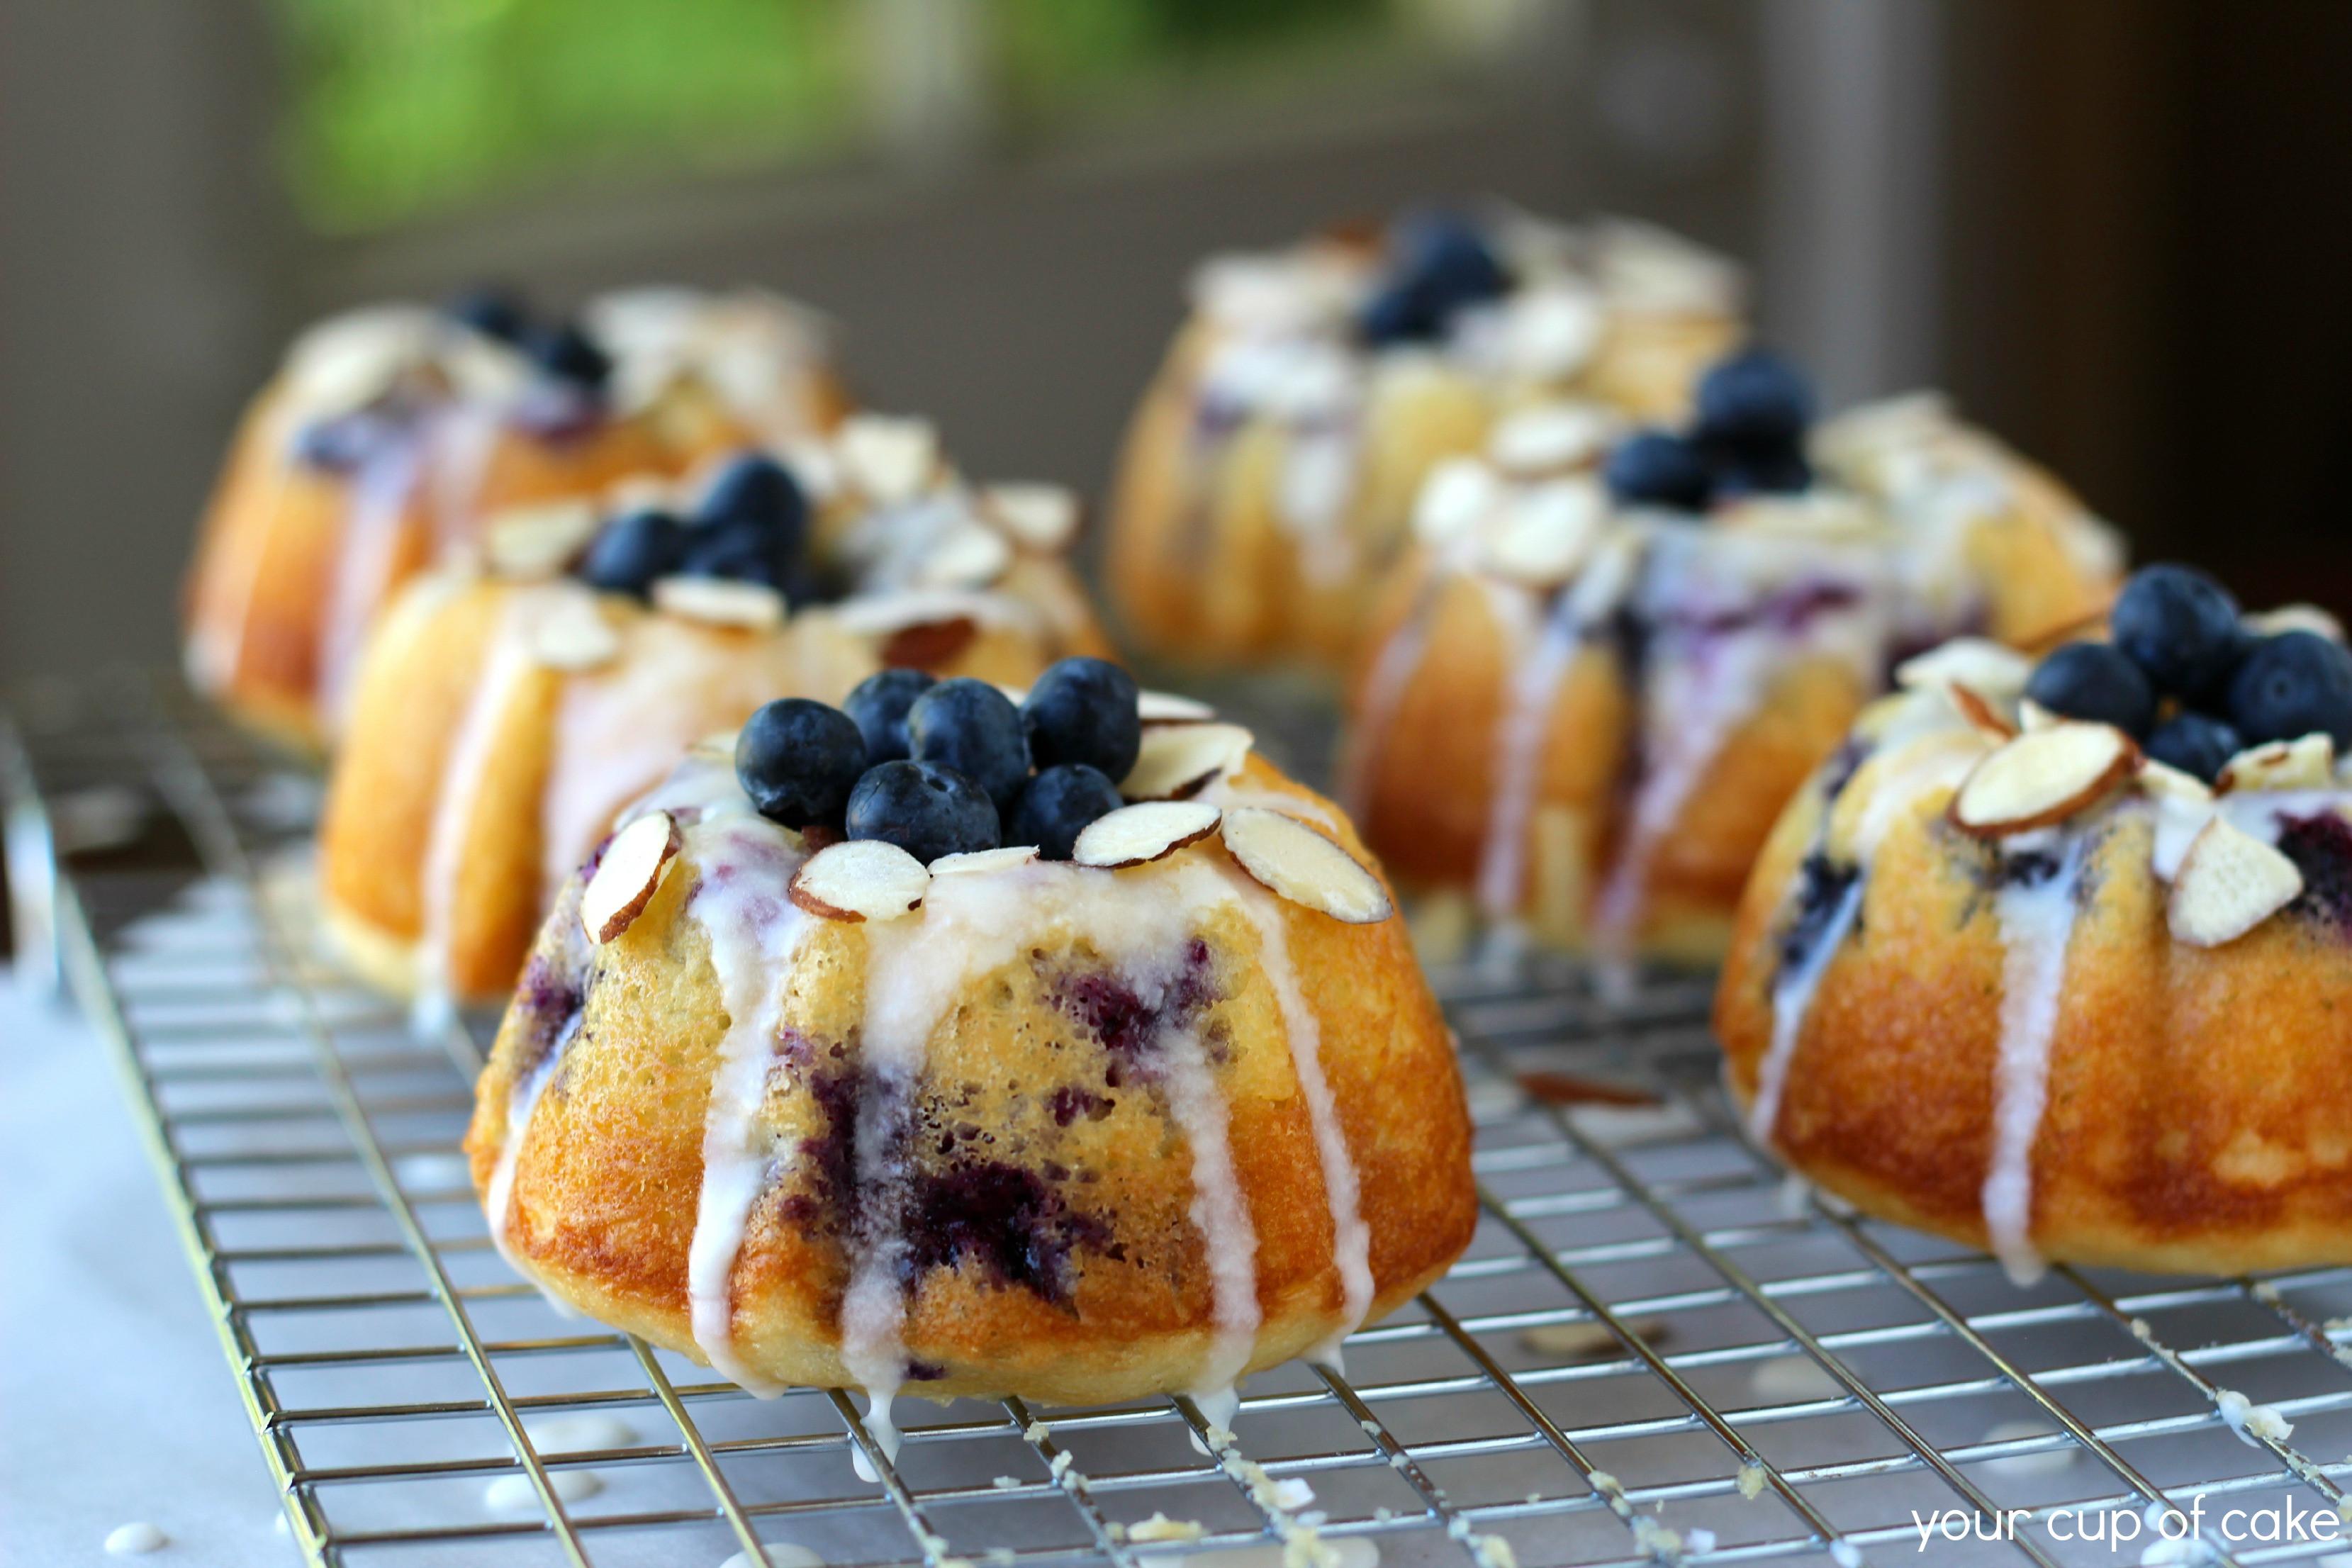 Mini Cake Recipe  Blueberry Almond Mini Bundt Cakes Your Cup of Cake